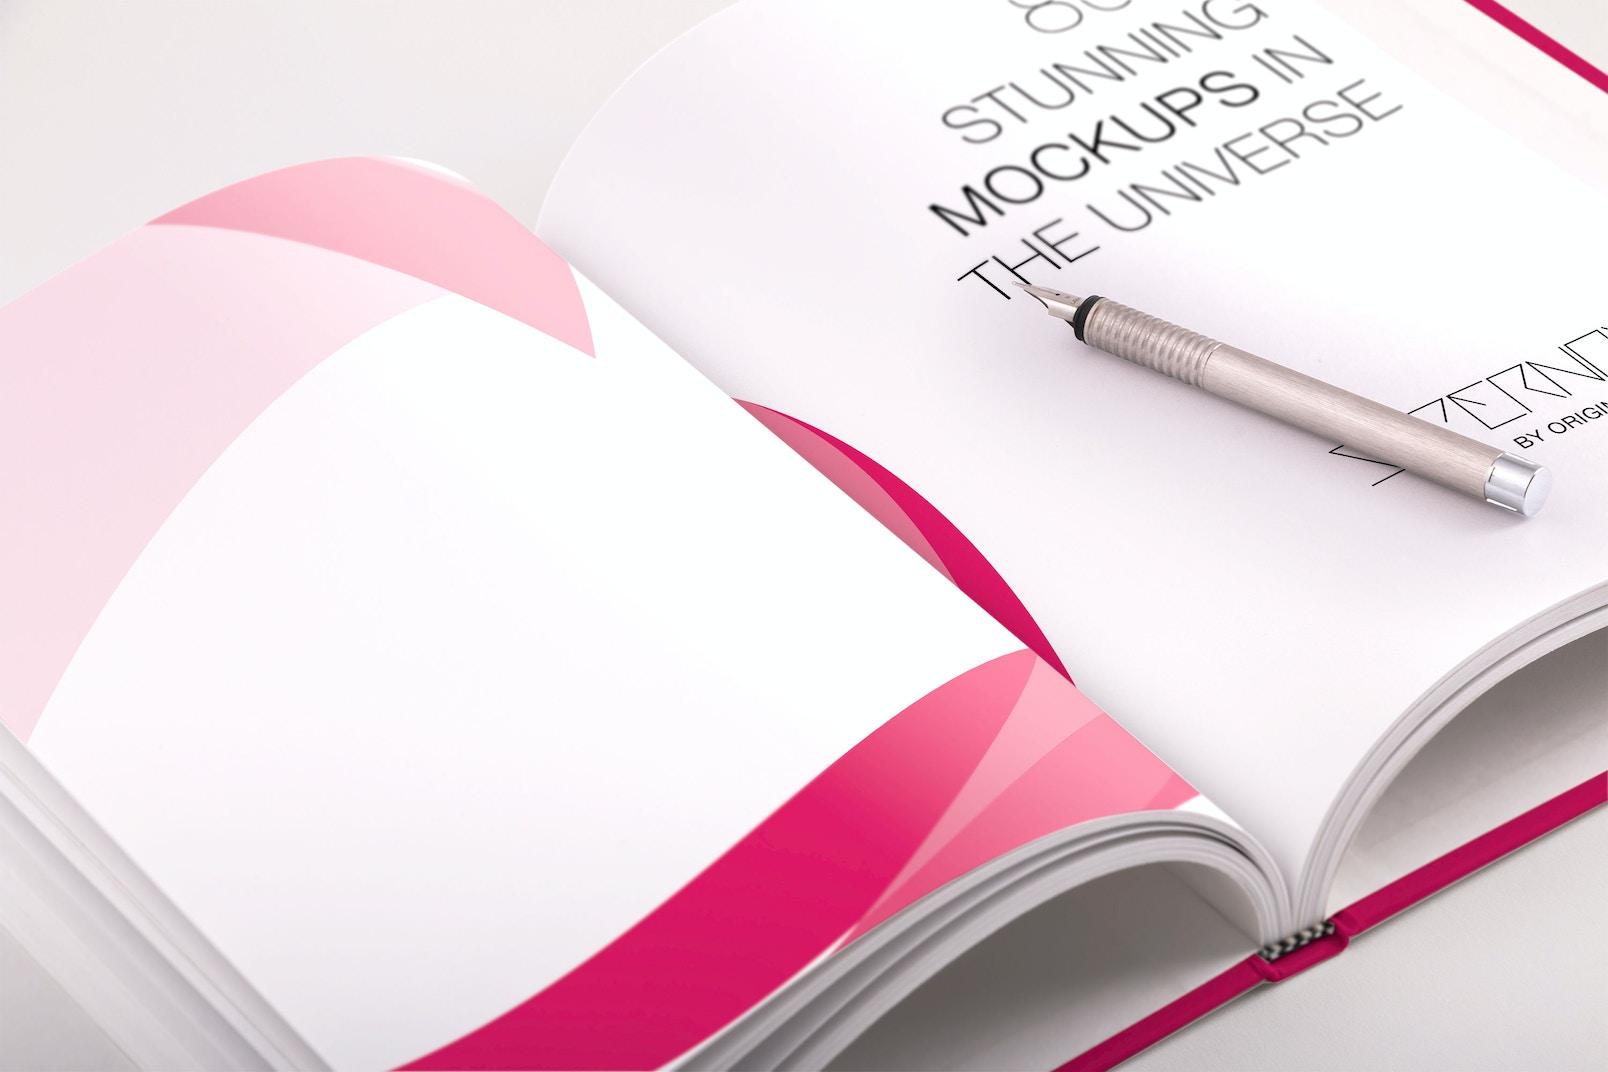 Hardcover Standard Portrait Book PSD Mockup 03